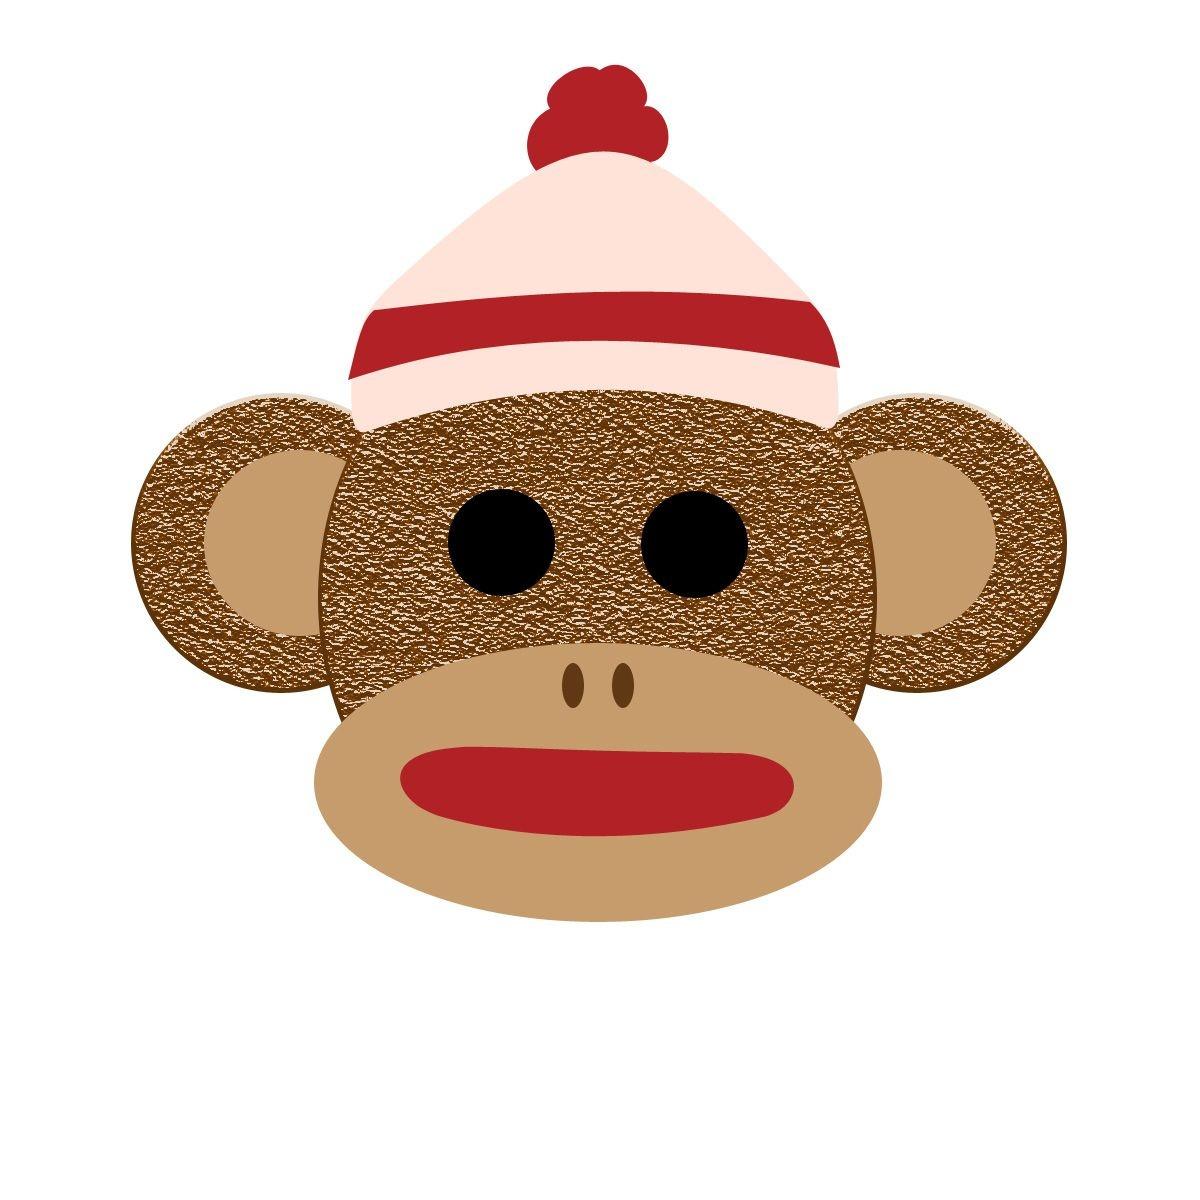 Printable Sock Monkey Clip Art For Free – 101 Clip Art | Monkey - Free Printable Sock Monkey Pictures